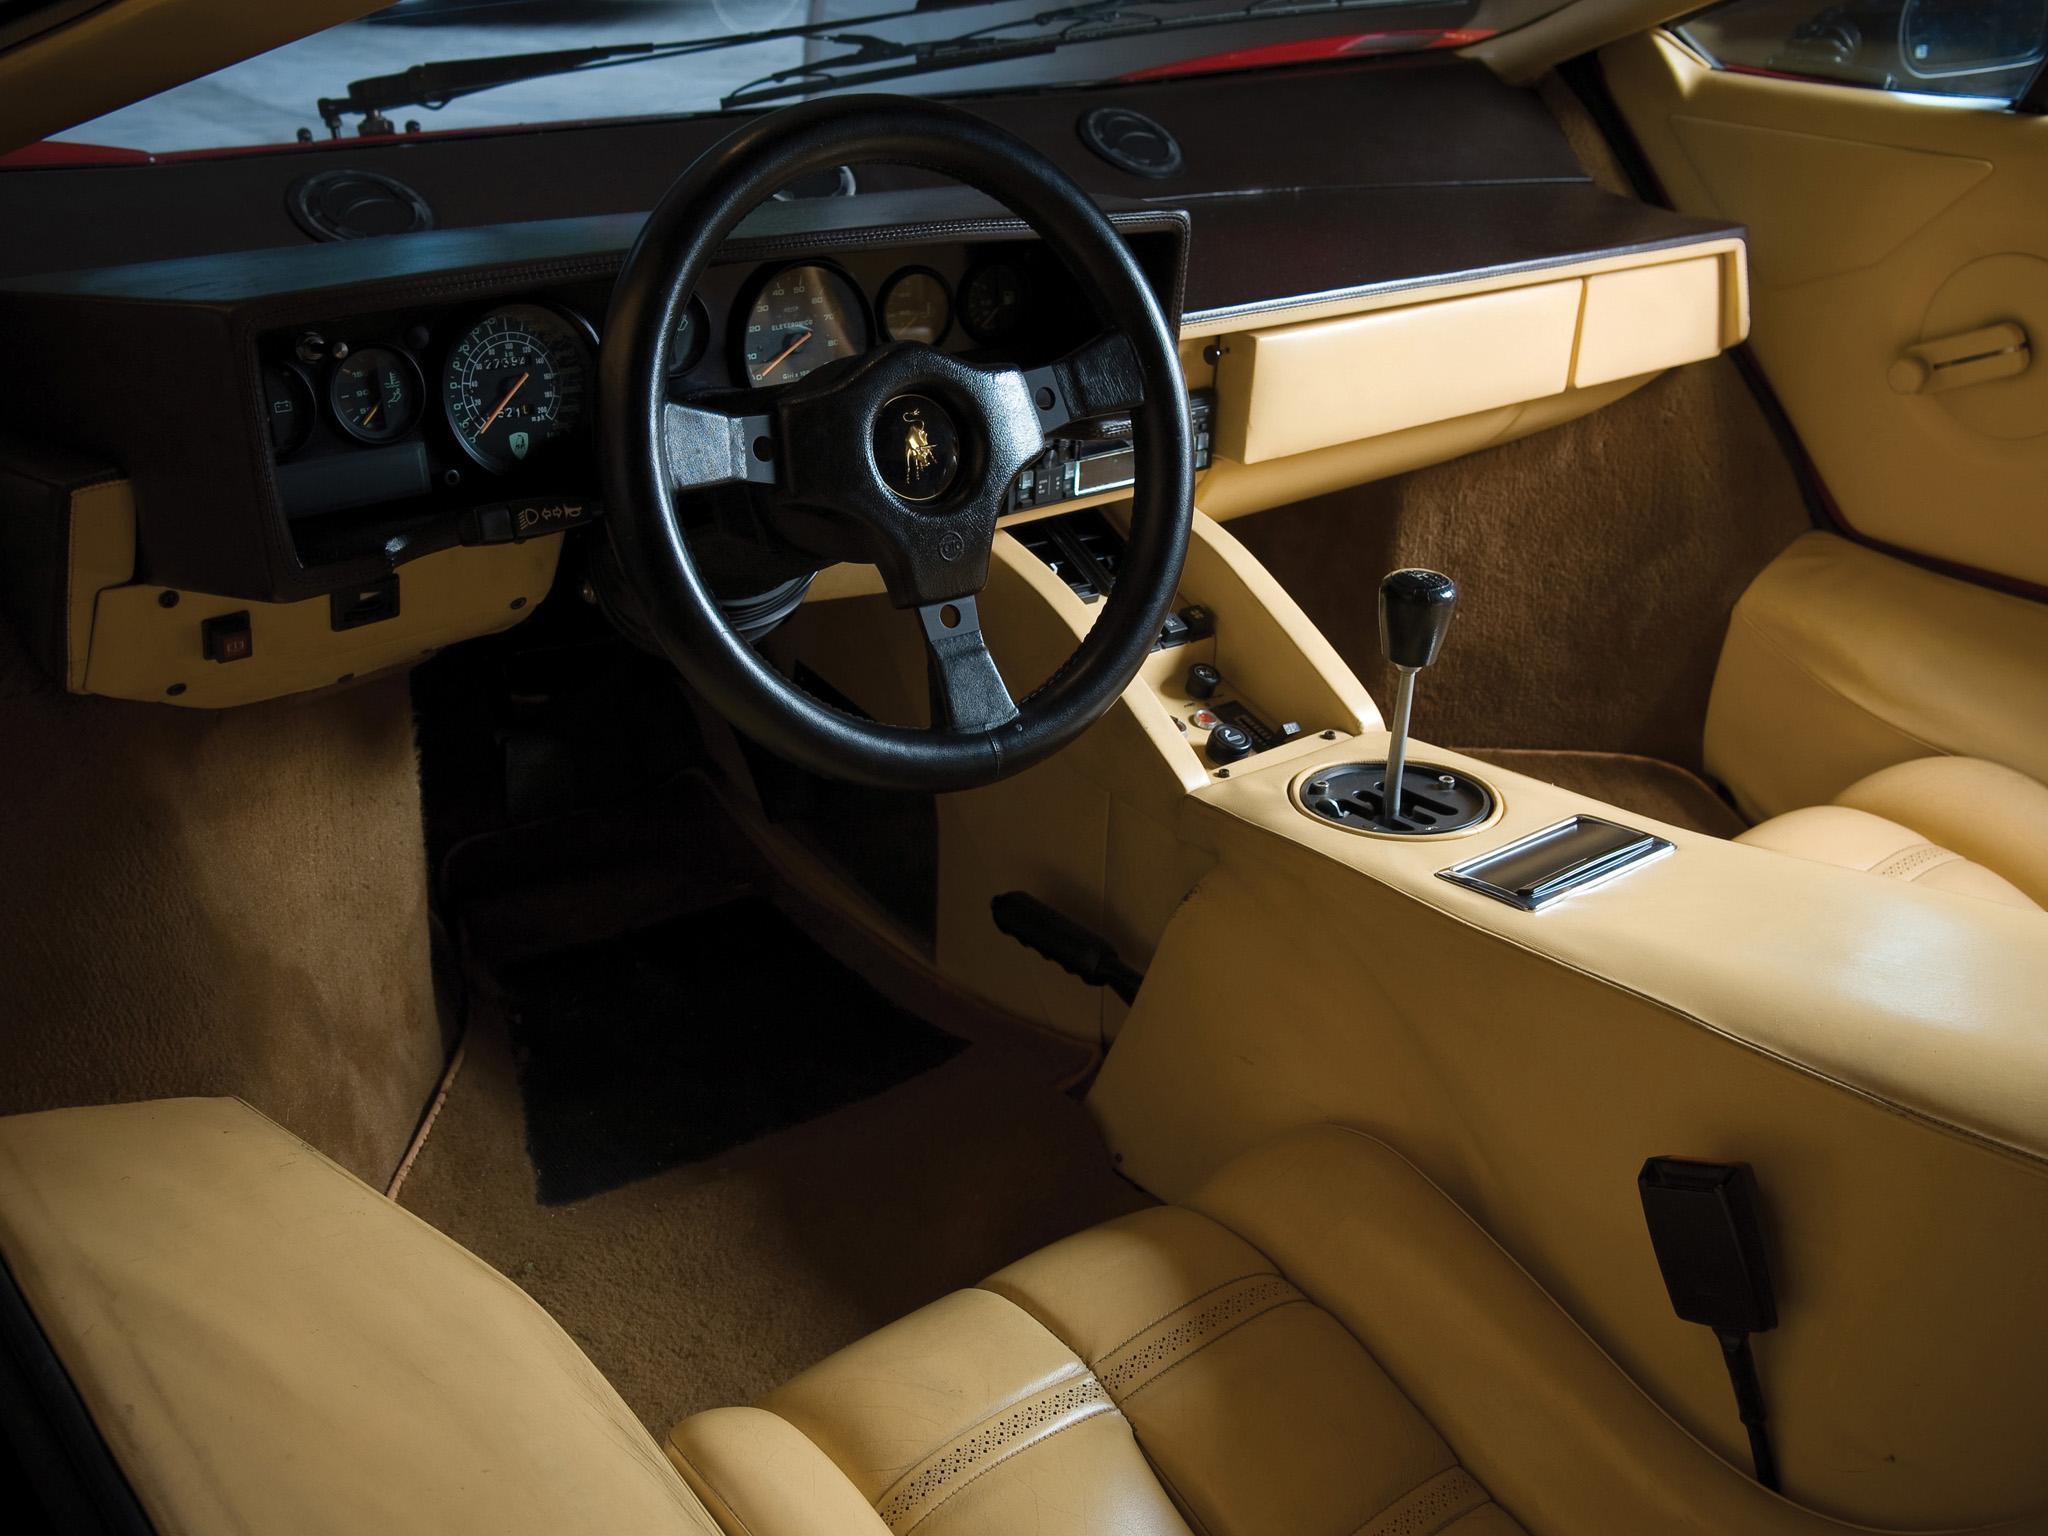 1985 lamborghini countach lp5000 s quattrovalvole lp5000 classic supercars supercar interior. Black Bedroom Furniture Sets. Home Design Ideas